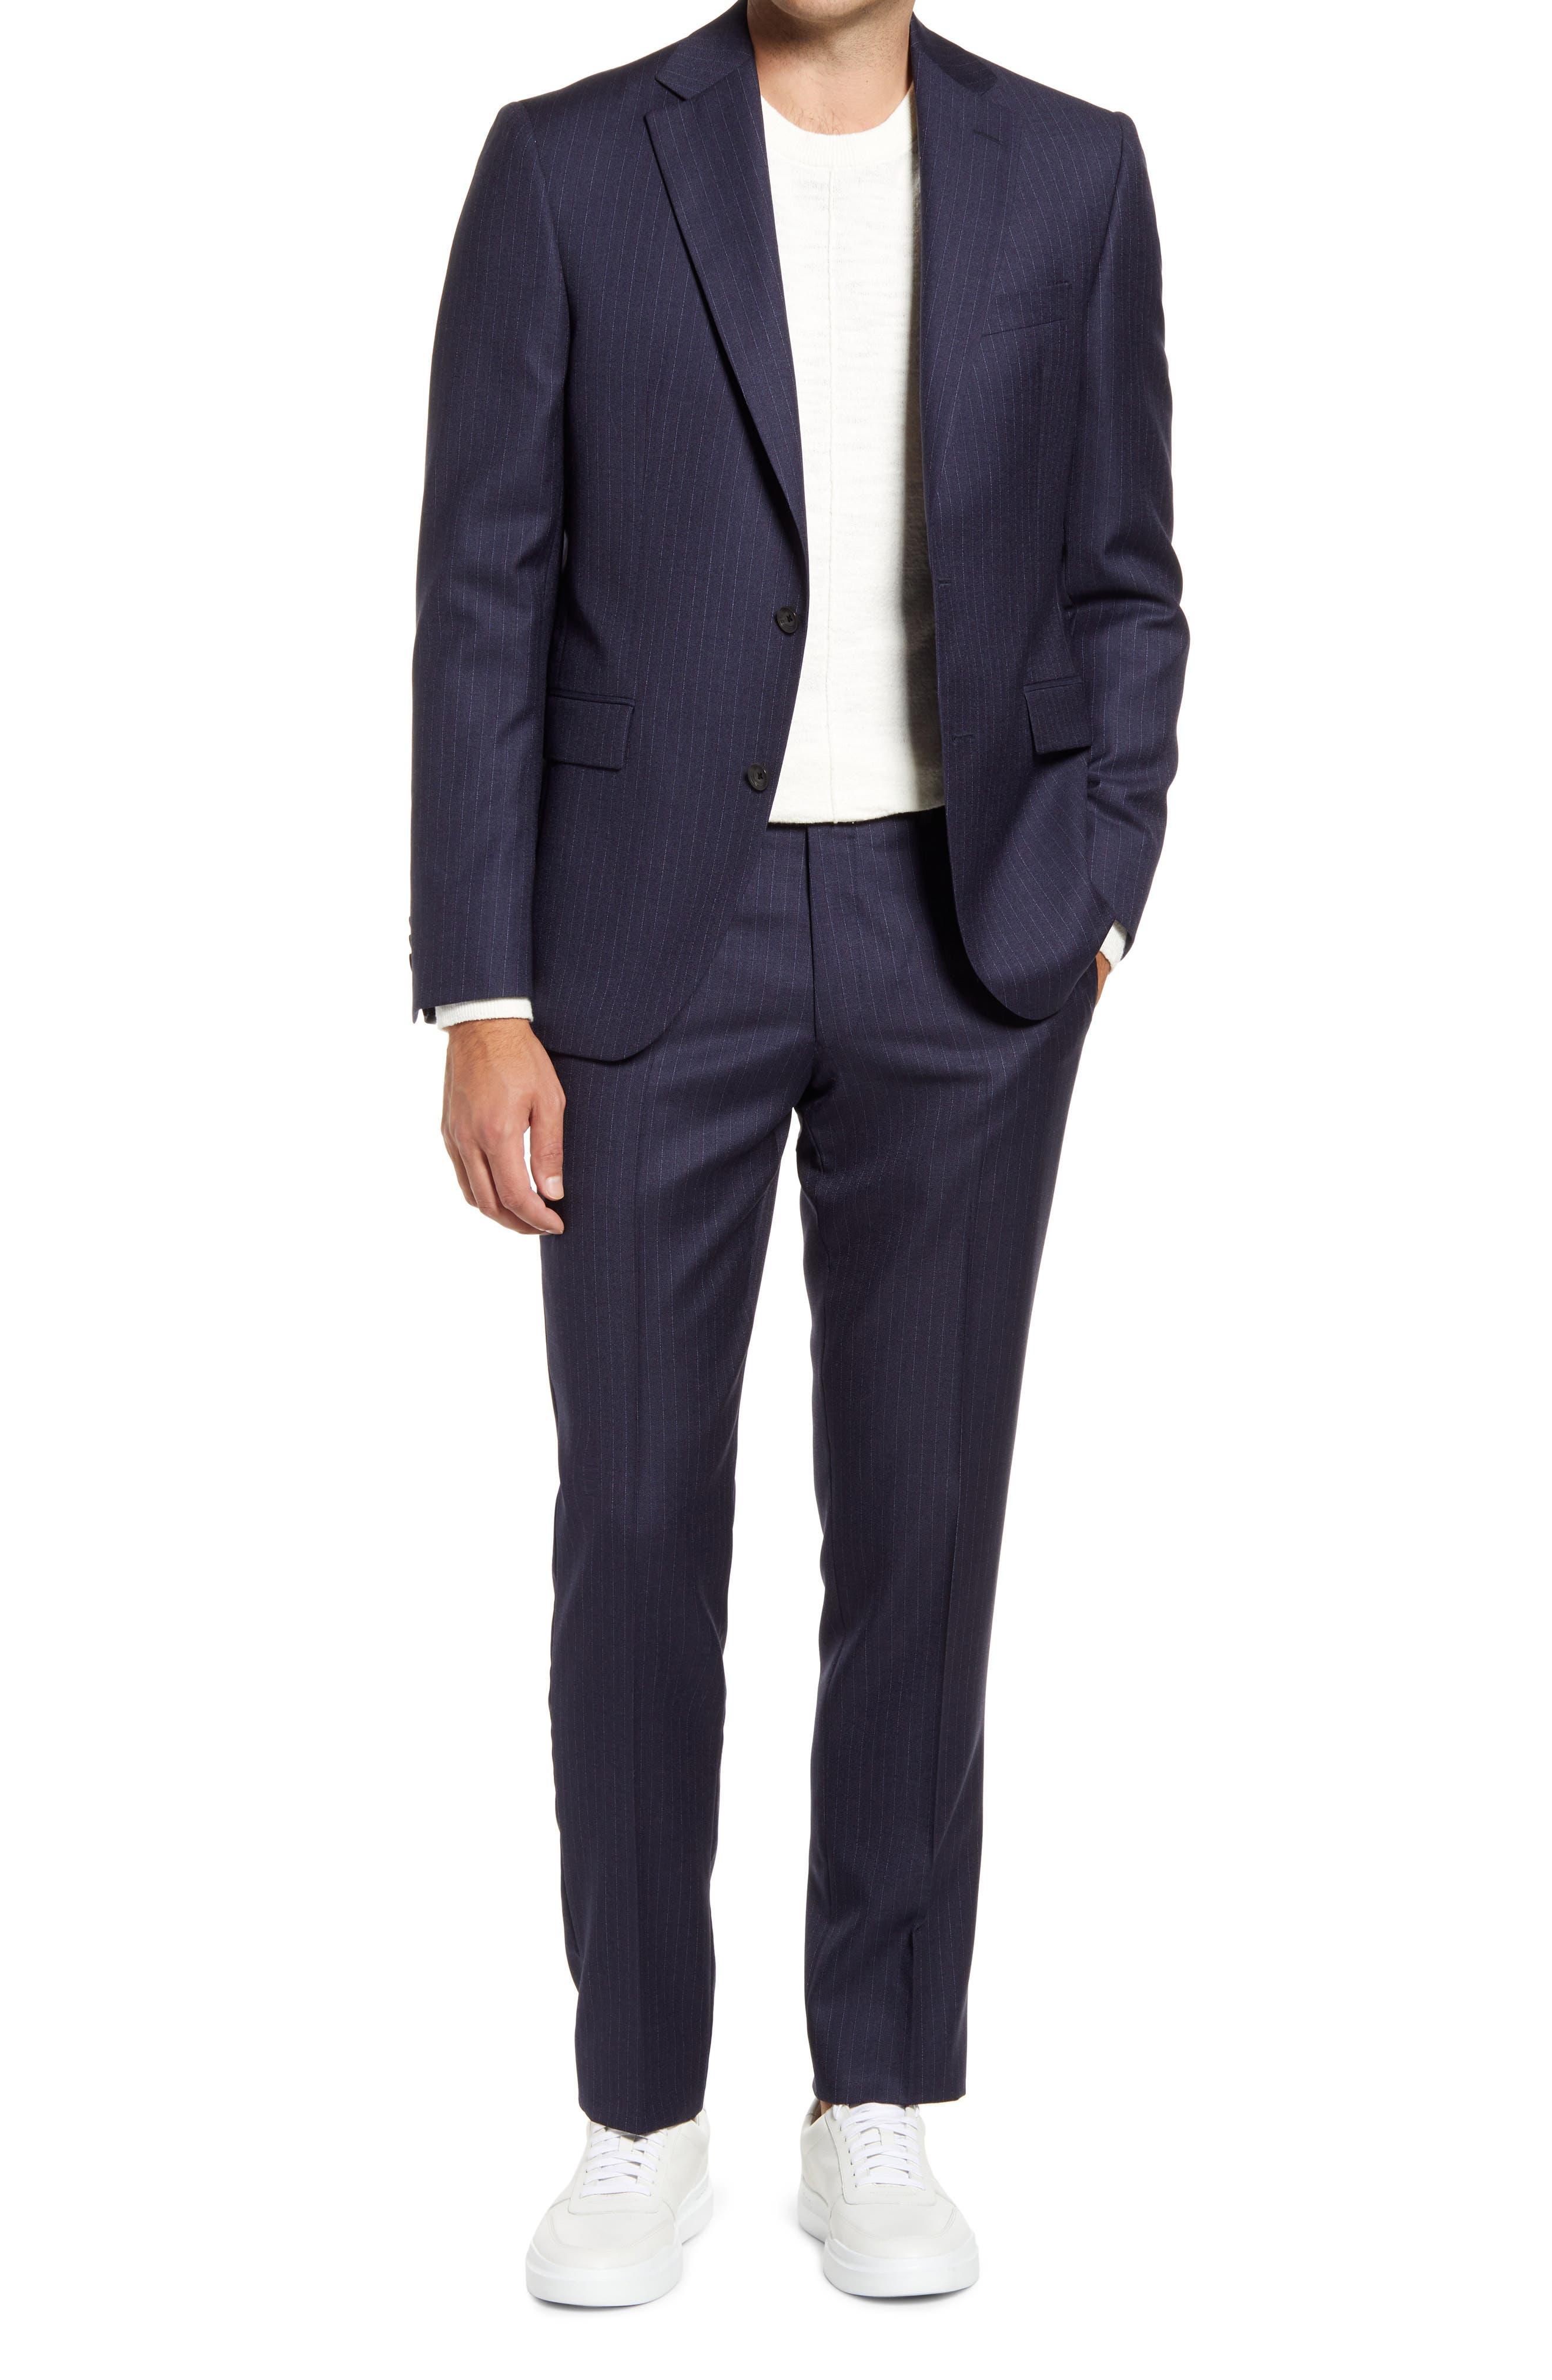 Esprit Contemporary Fit Navy Pinstripe Wool Suit